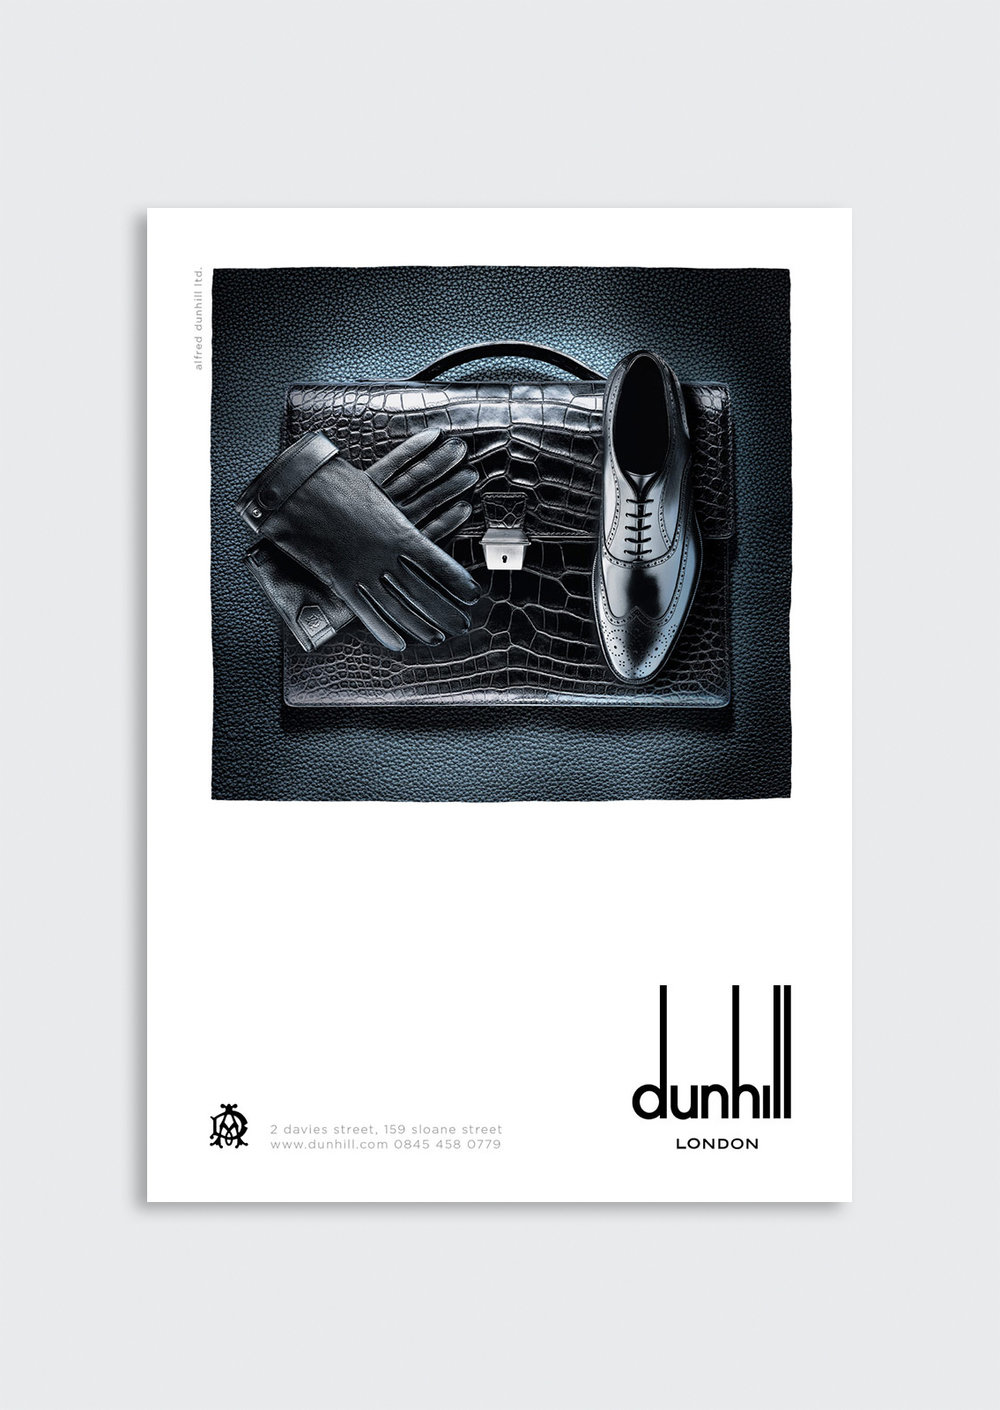 Dunhill-Portfolio-Image-14 1 Grey.jpg